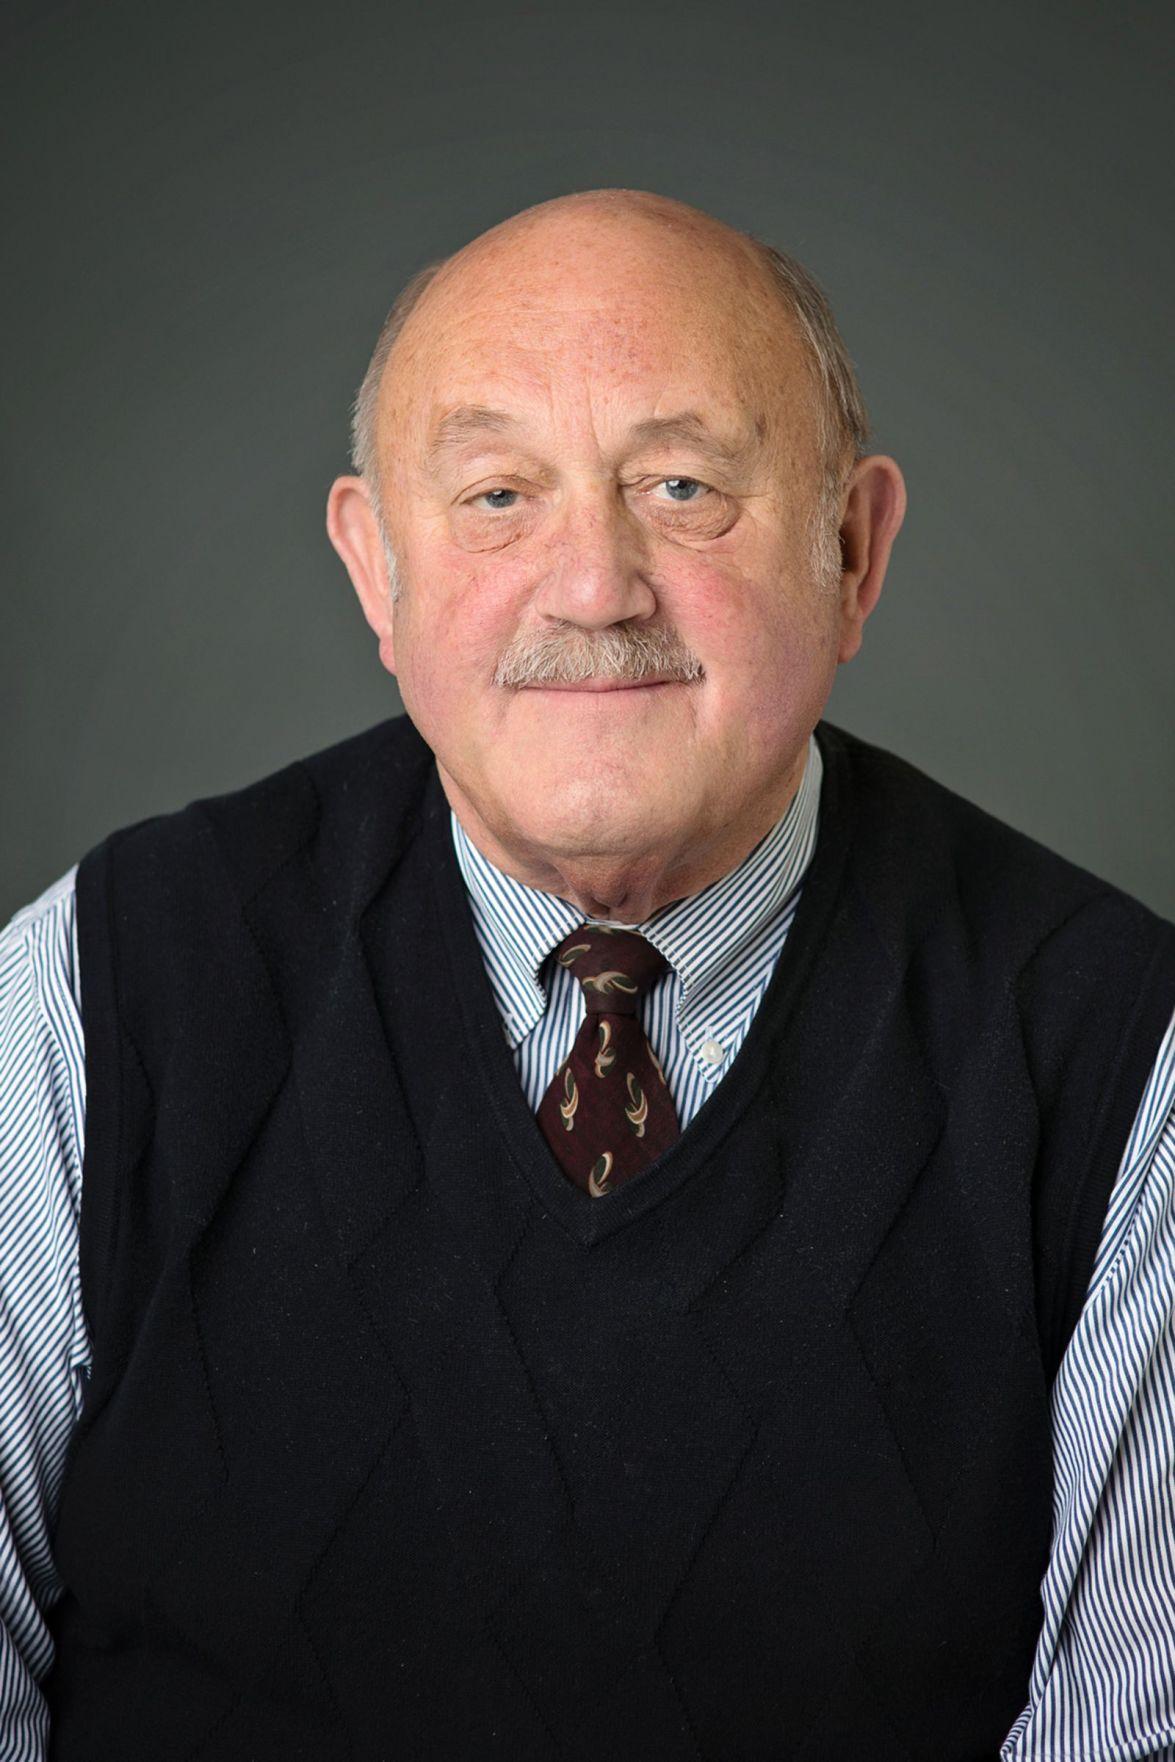 Givens, Murdock running again for Umatilla County board